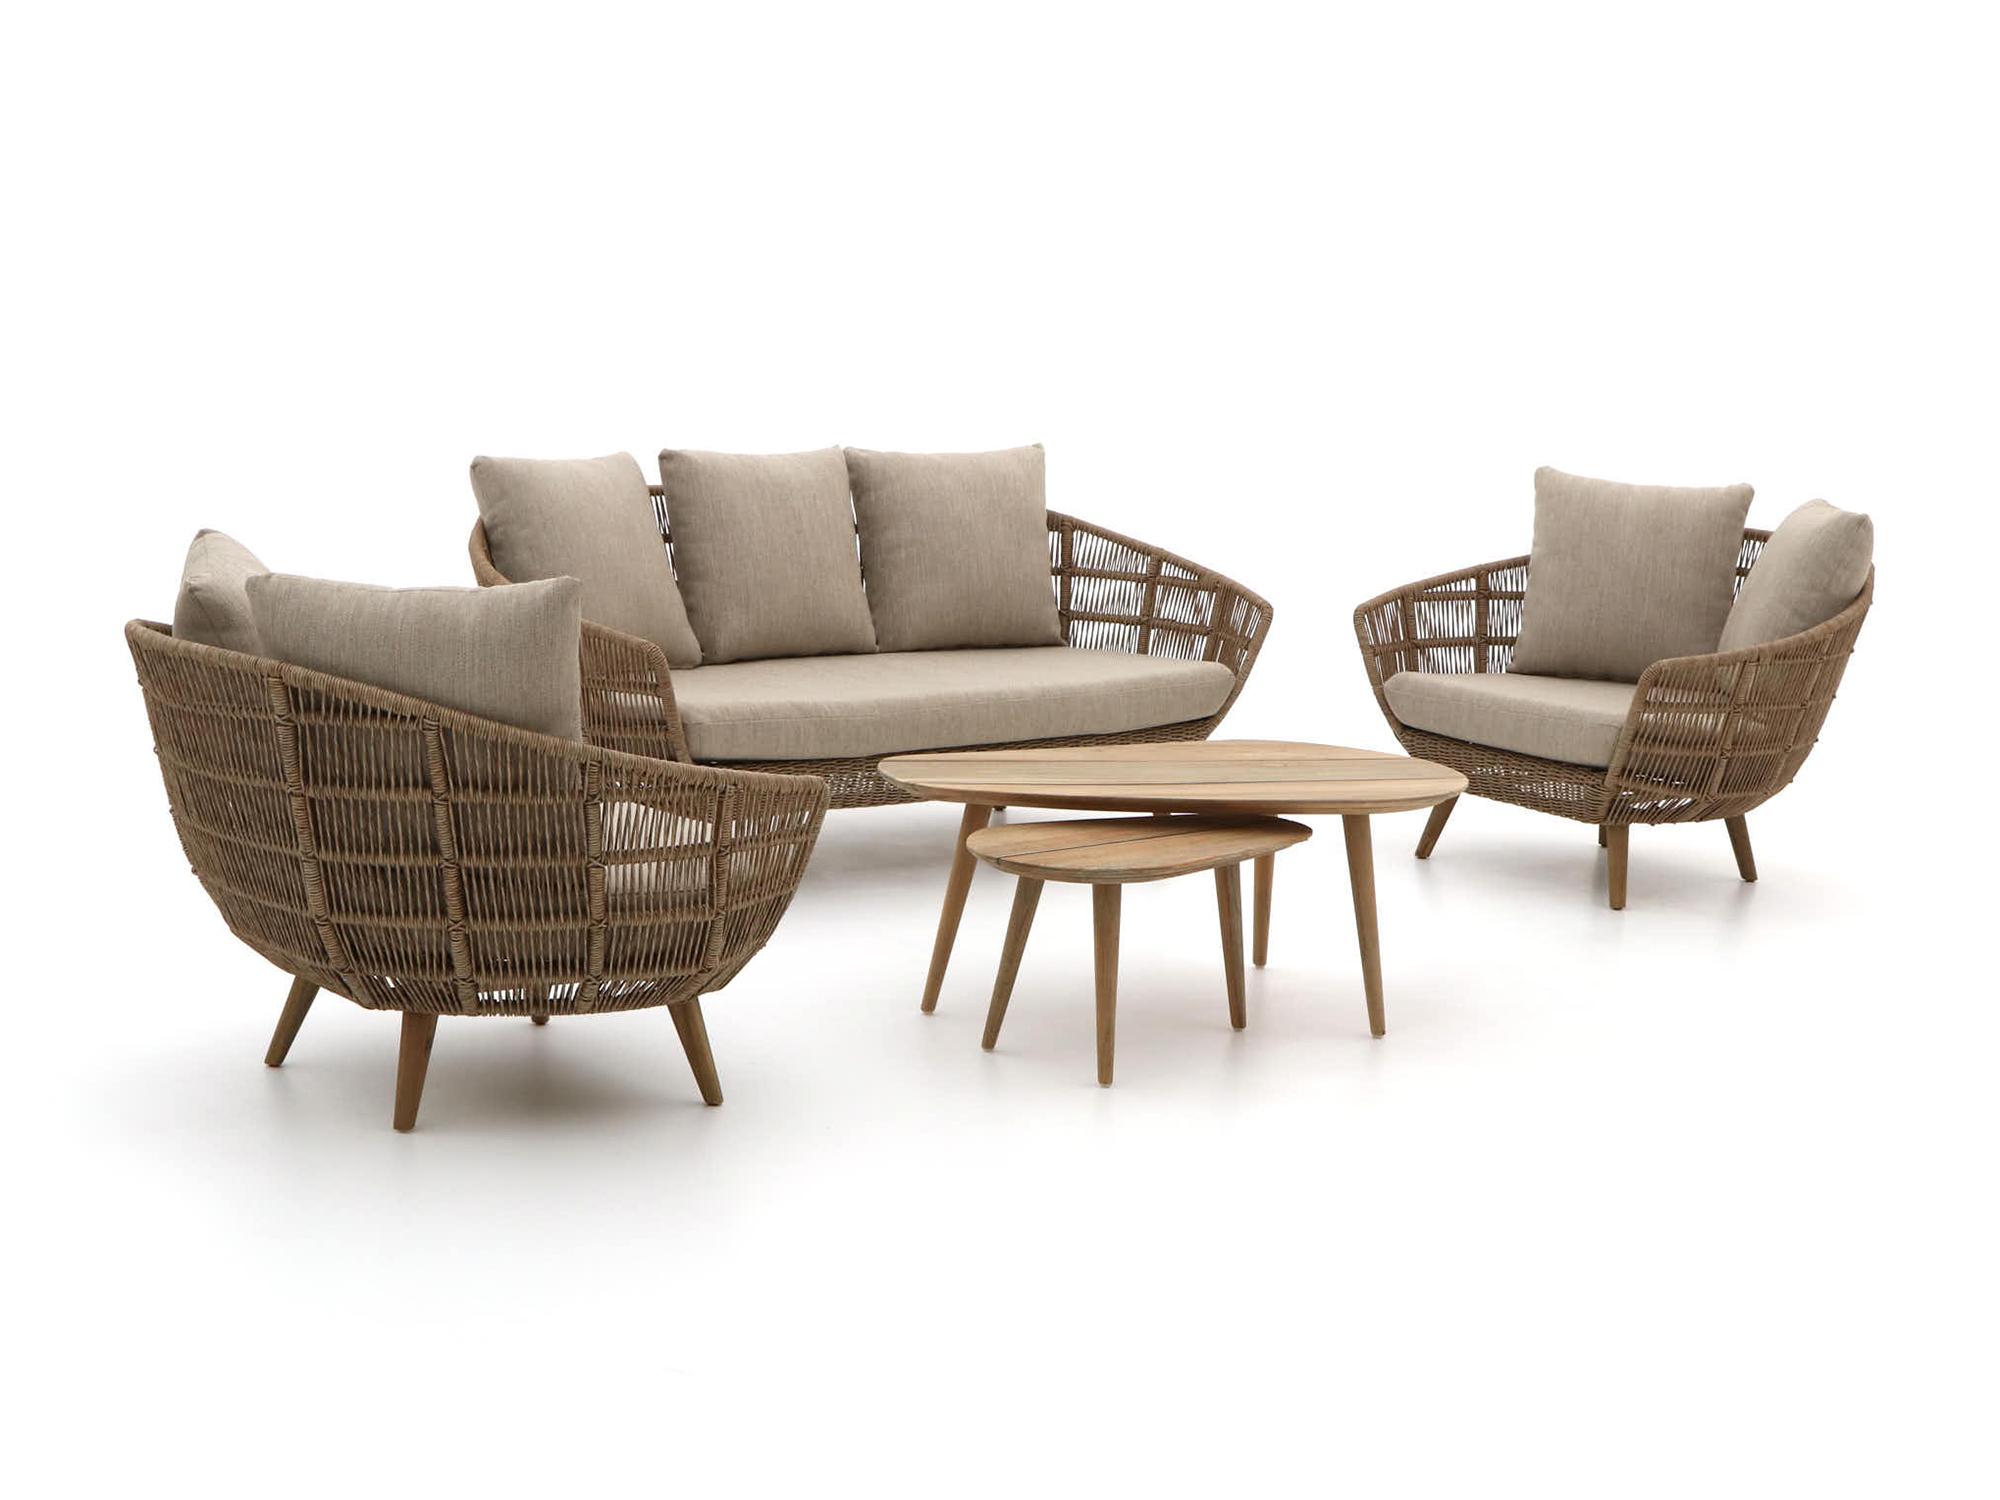 Intenso Stila/ROUGH-K stoel-bank loungeset 5-delig - Laagste prijsgarantie!